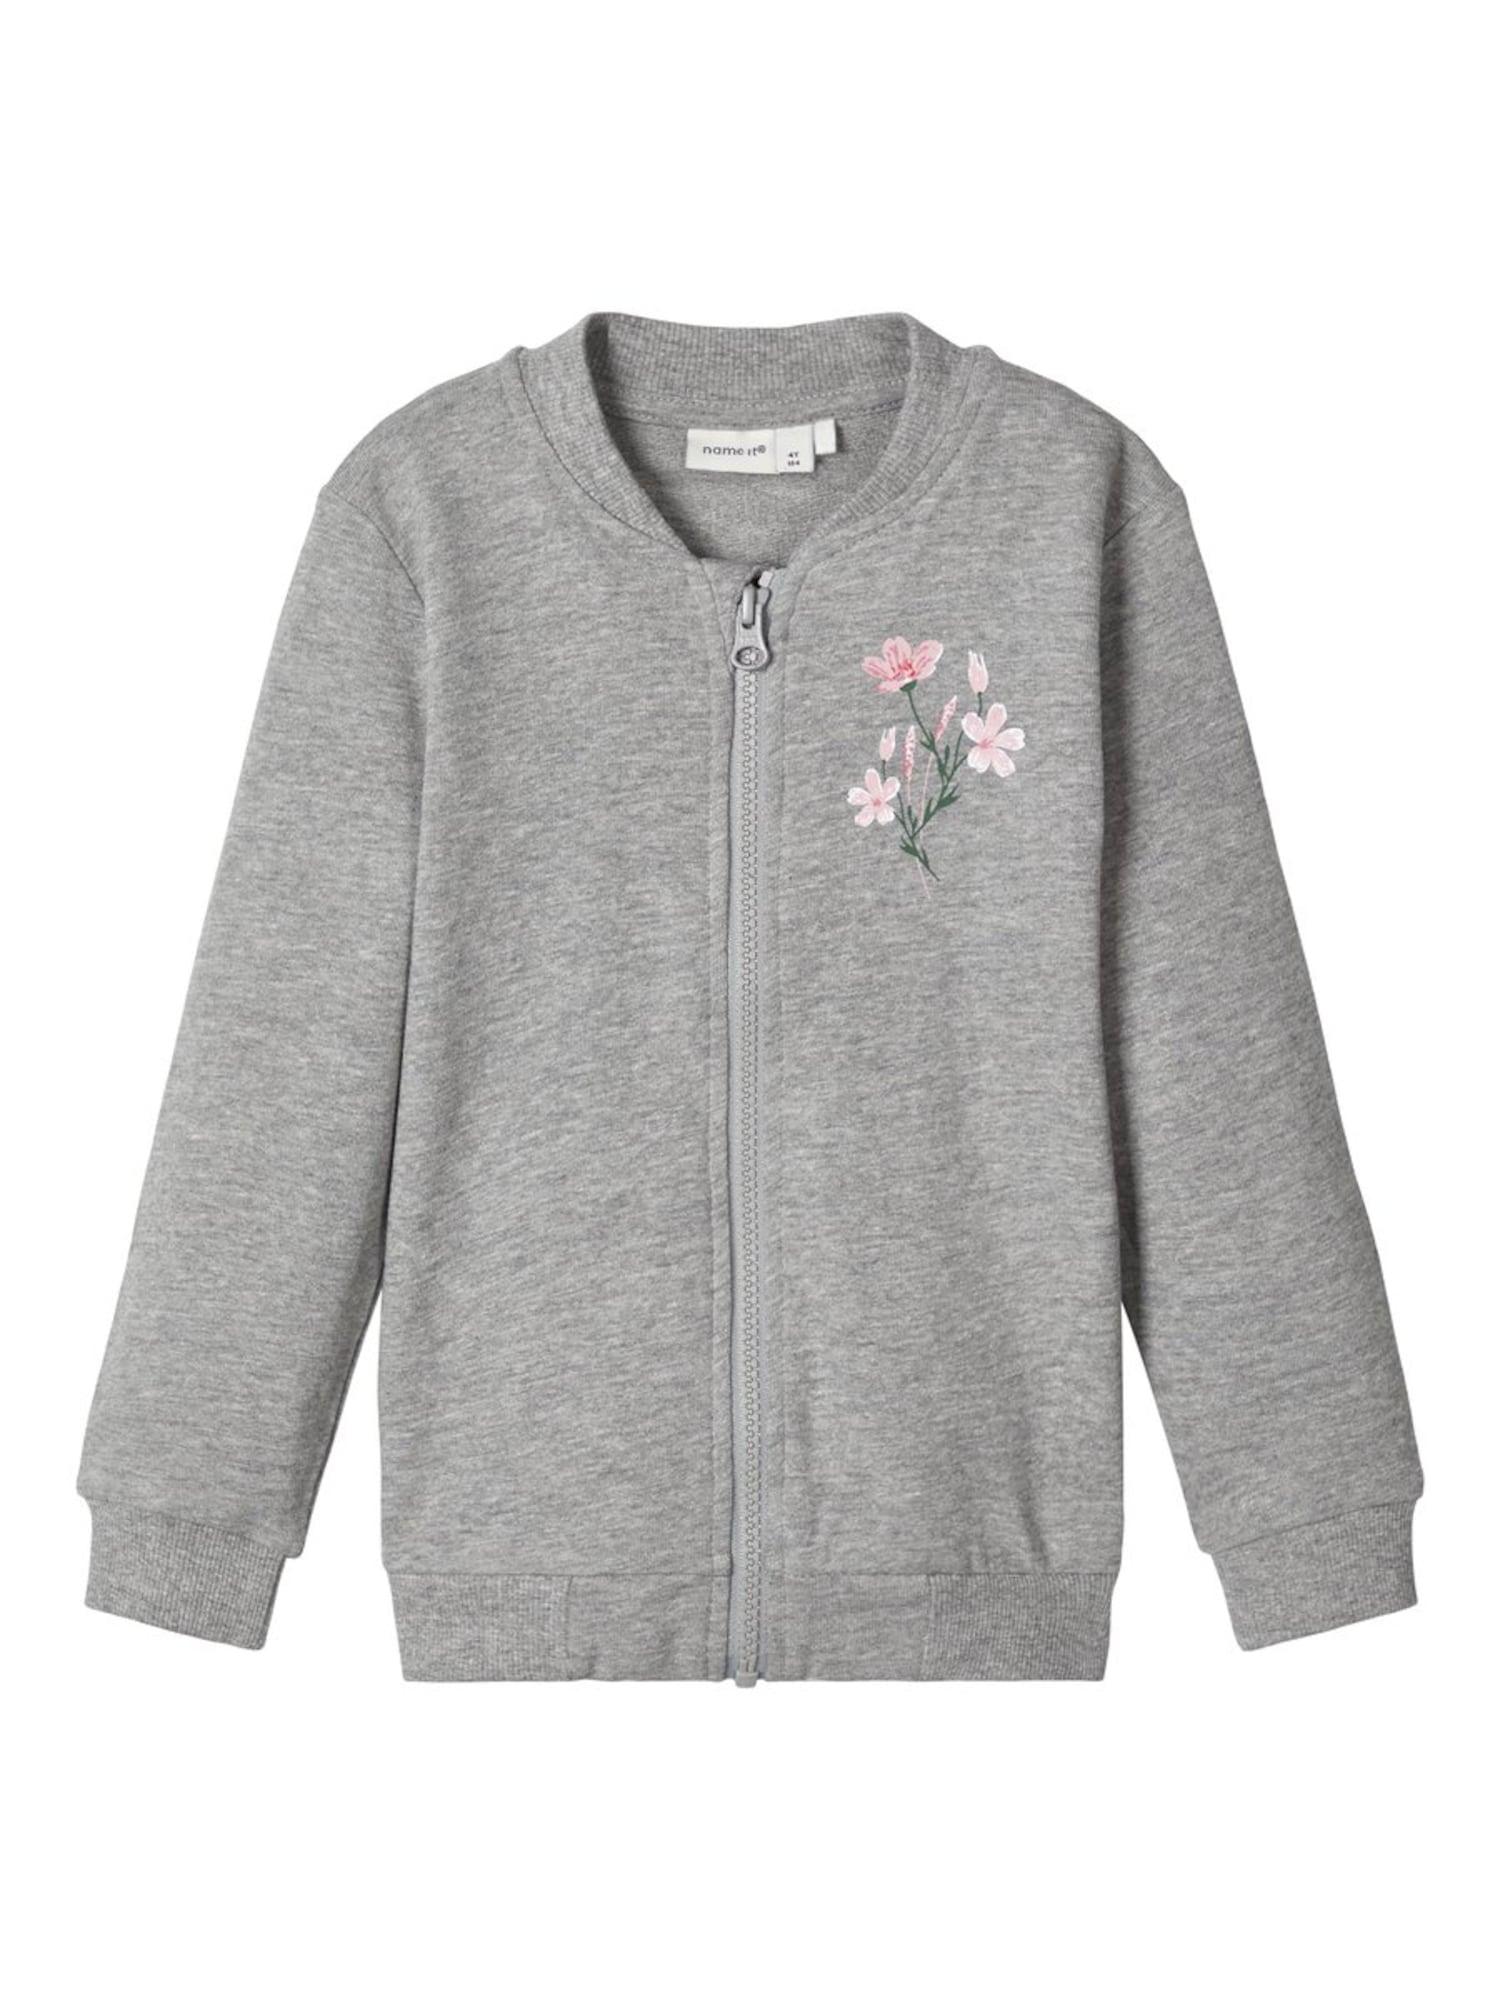 NAME IT Džemperis 'NMFBEATE LS CARD UNB CAMP' margai pilka / rožių spalva